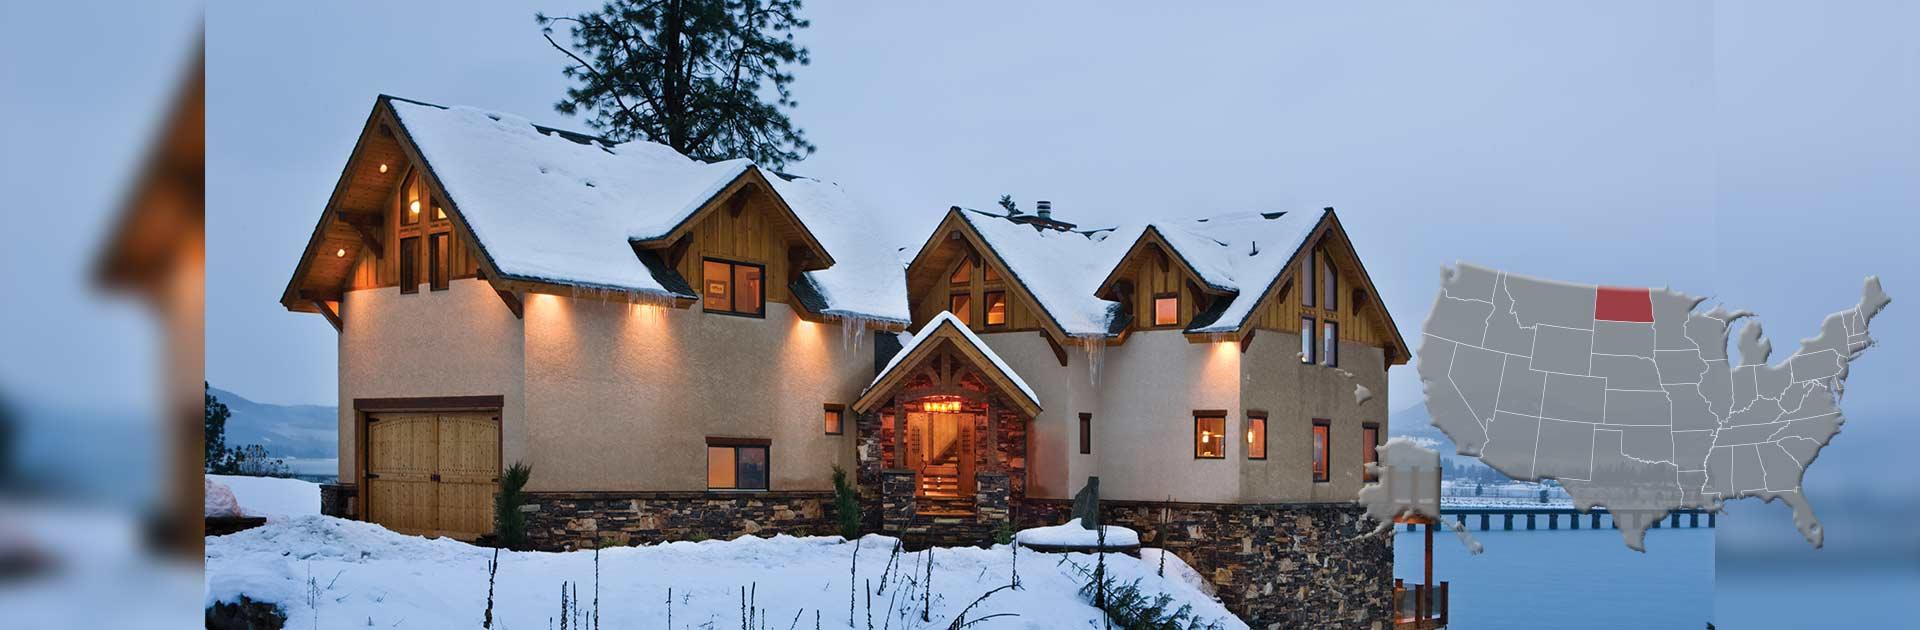 North dakota log and timber frame homes by precisioncraft for North dakota home builders